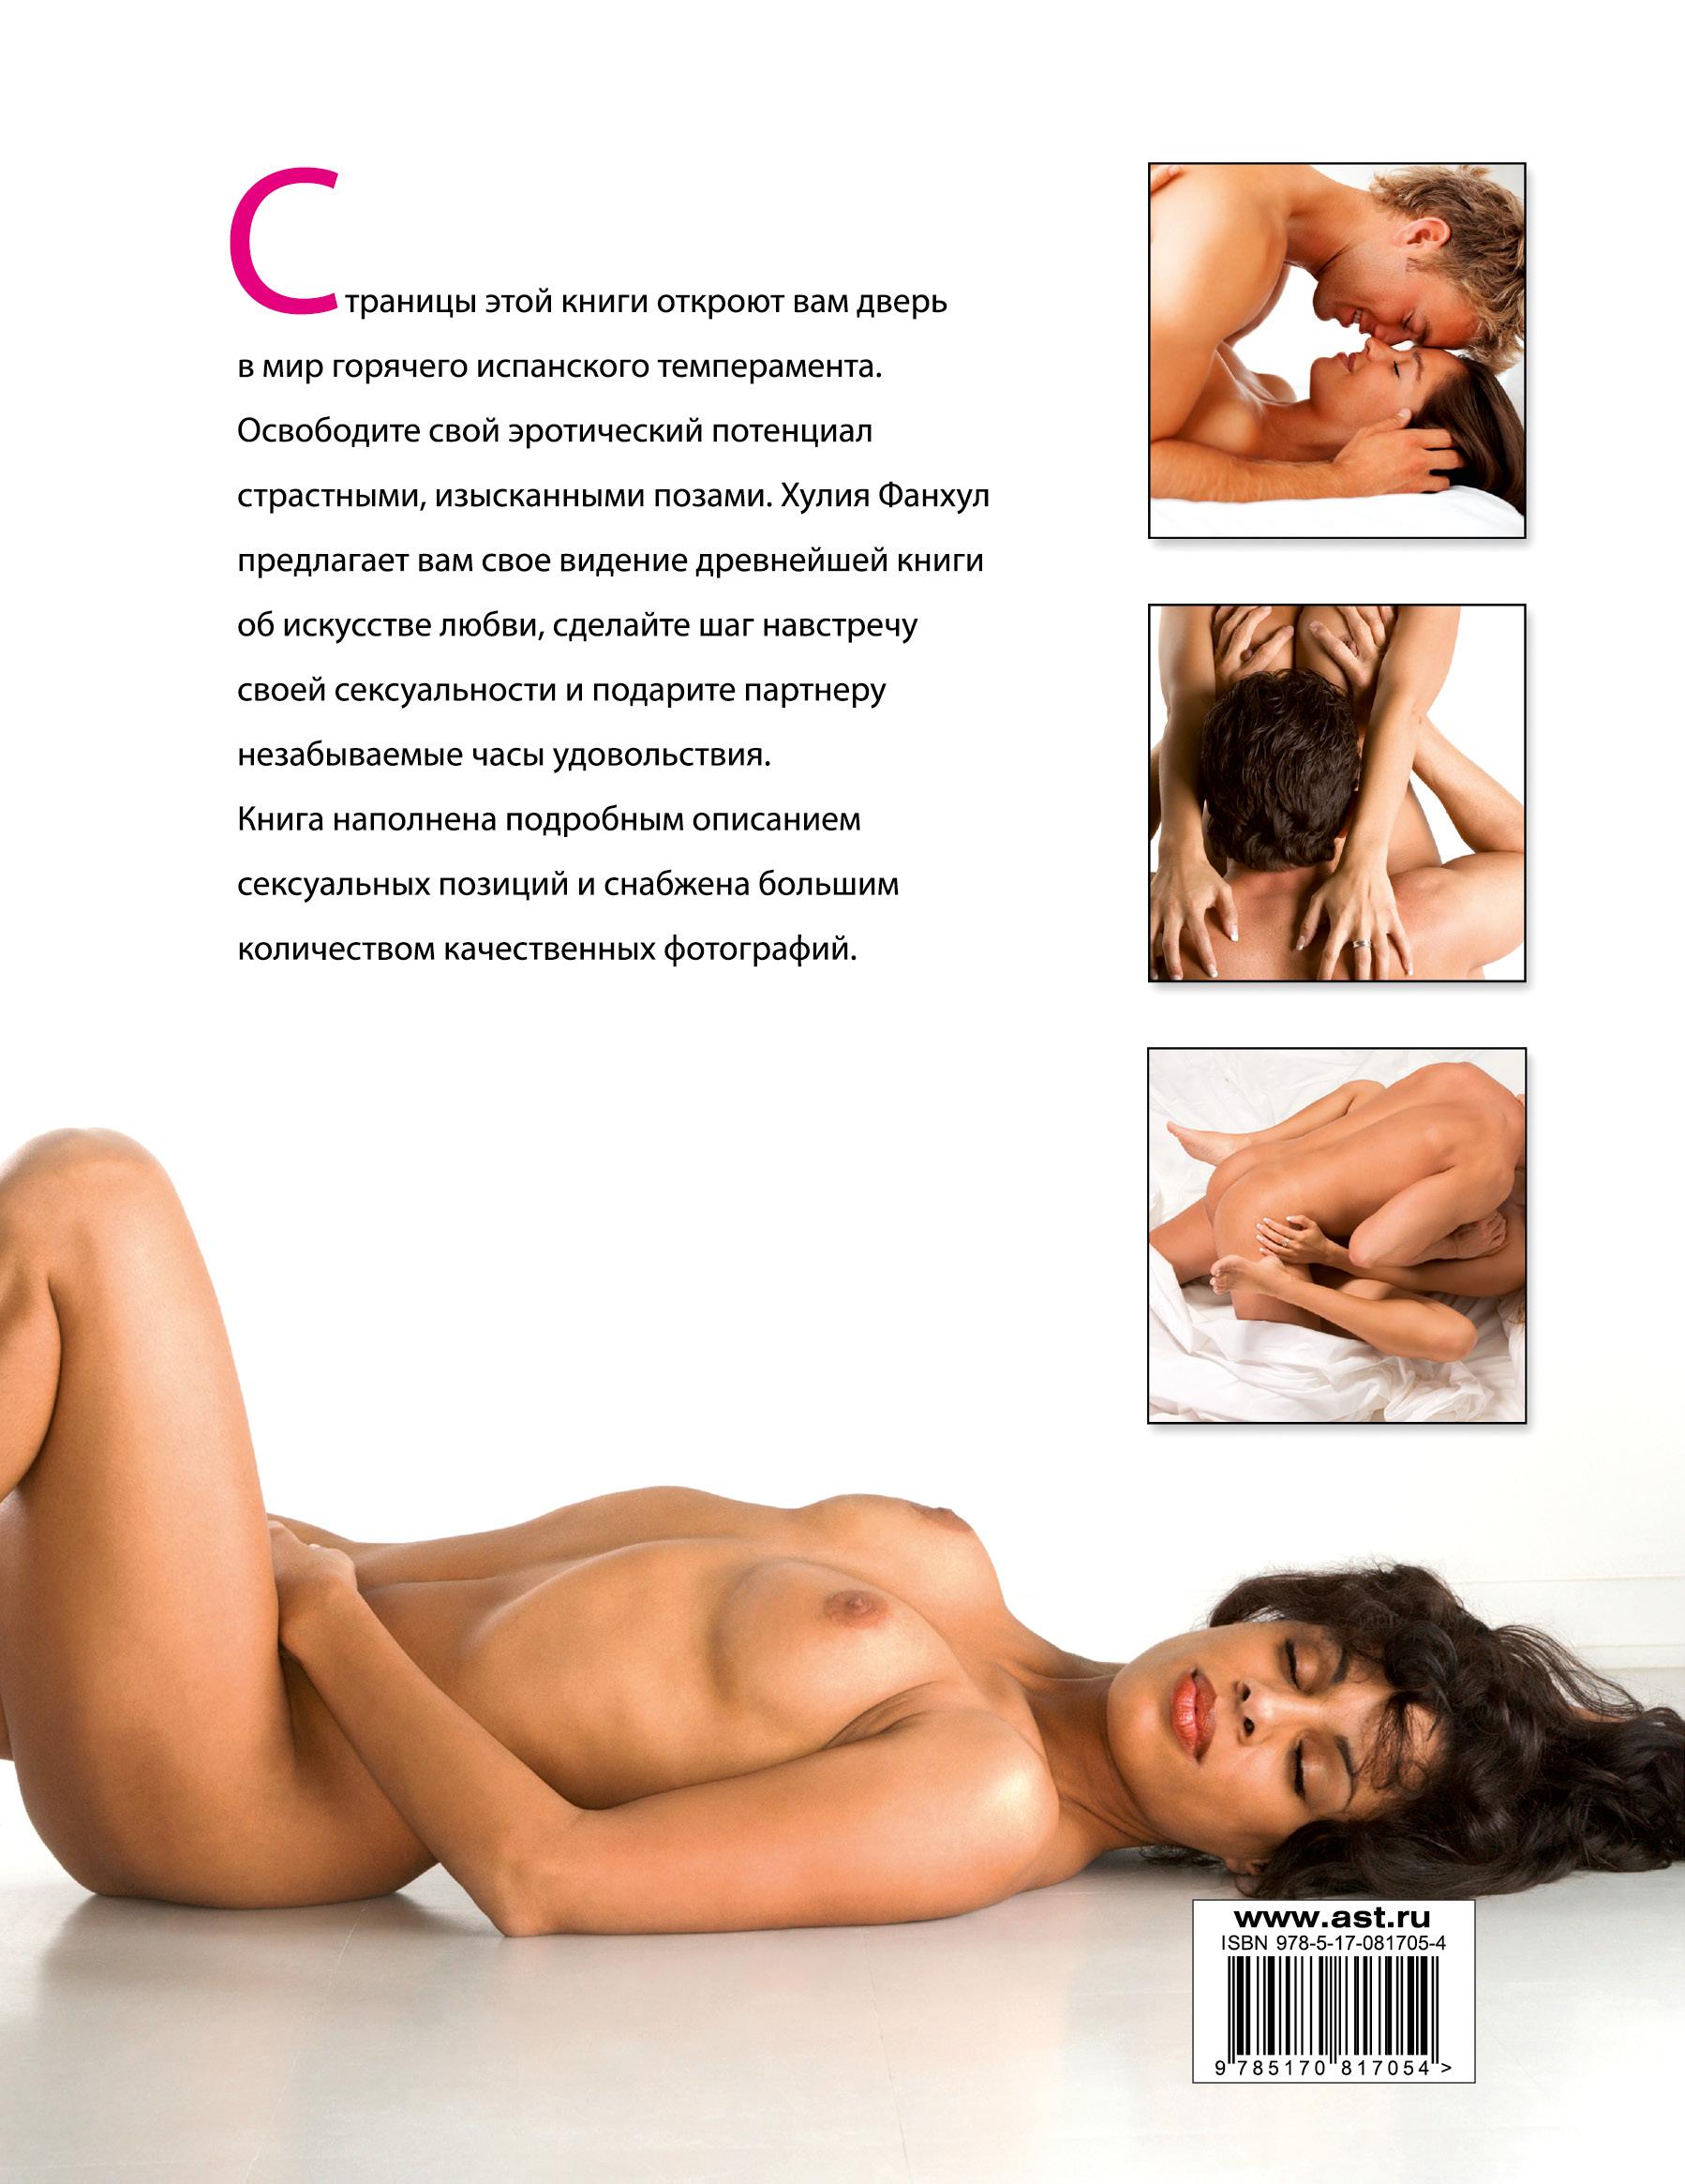 Описание занятий сексом